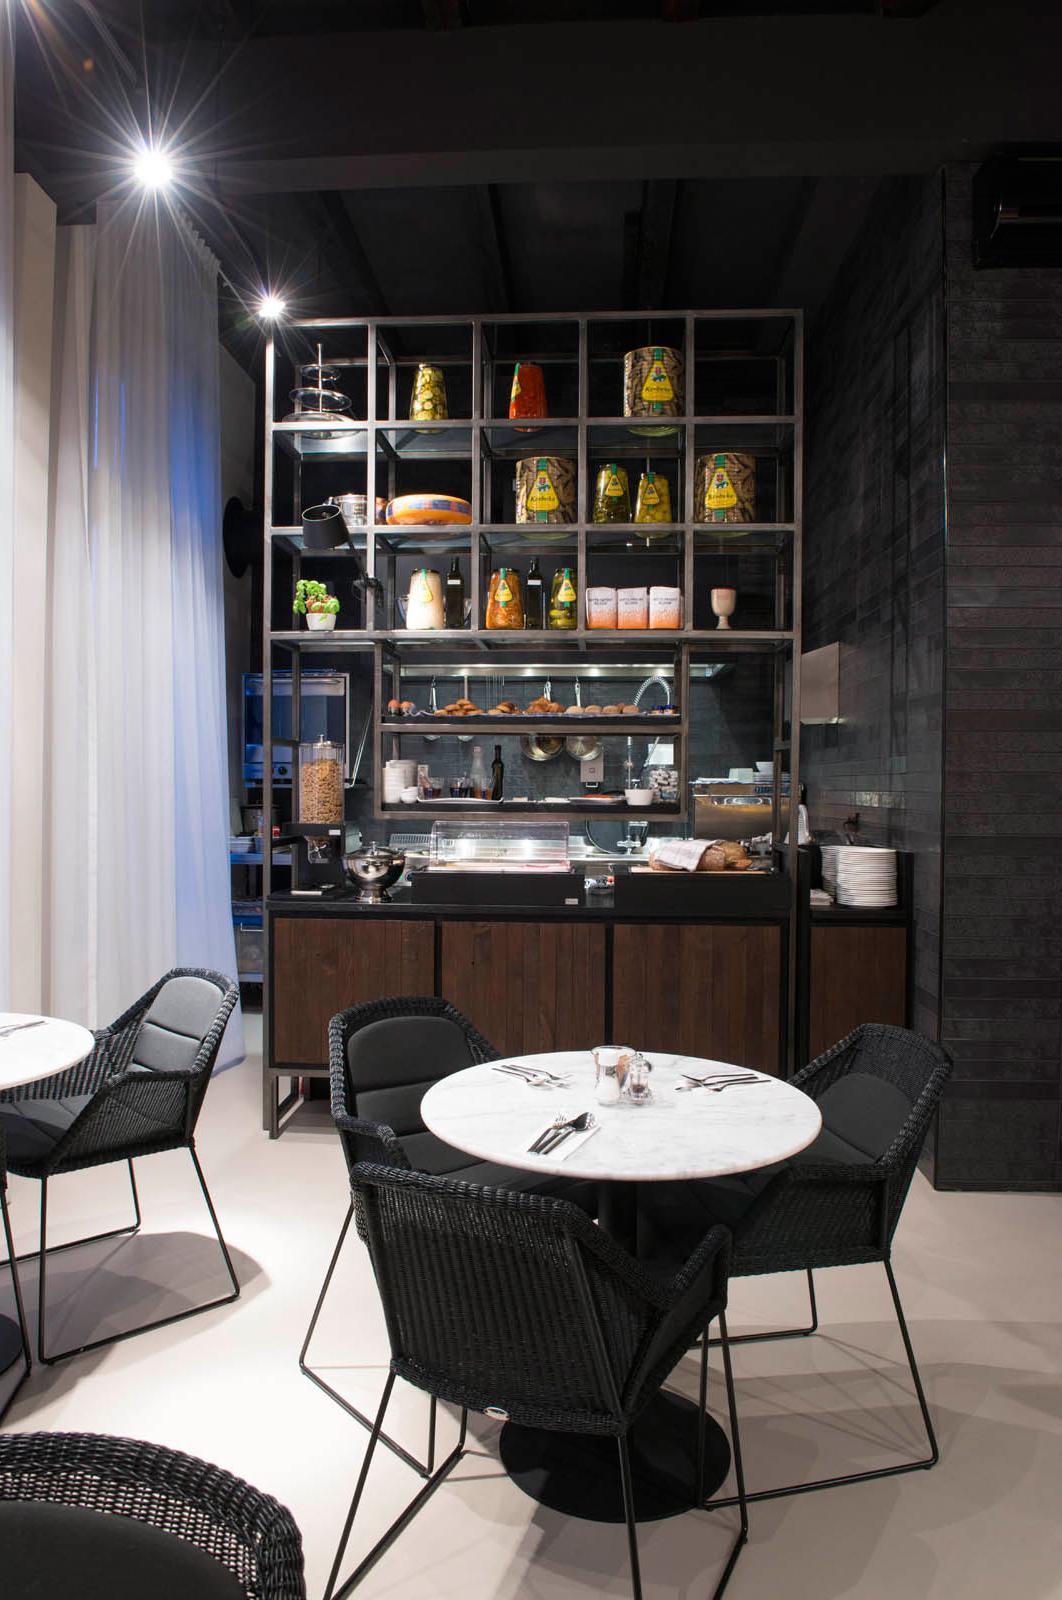 jeroendenijs-hotel-keuken piet hein amsterdam